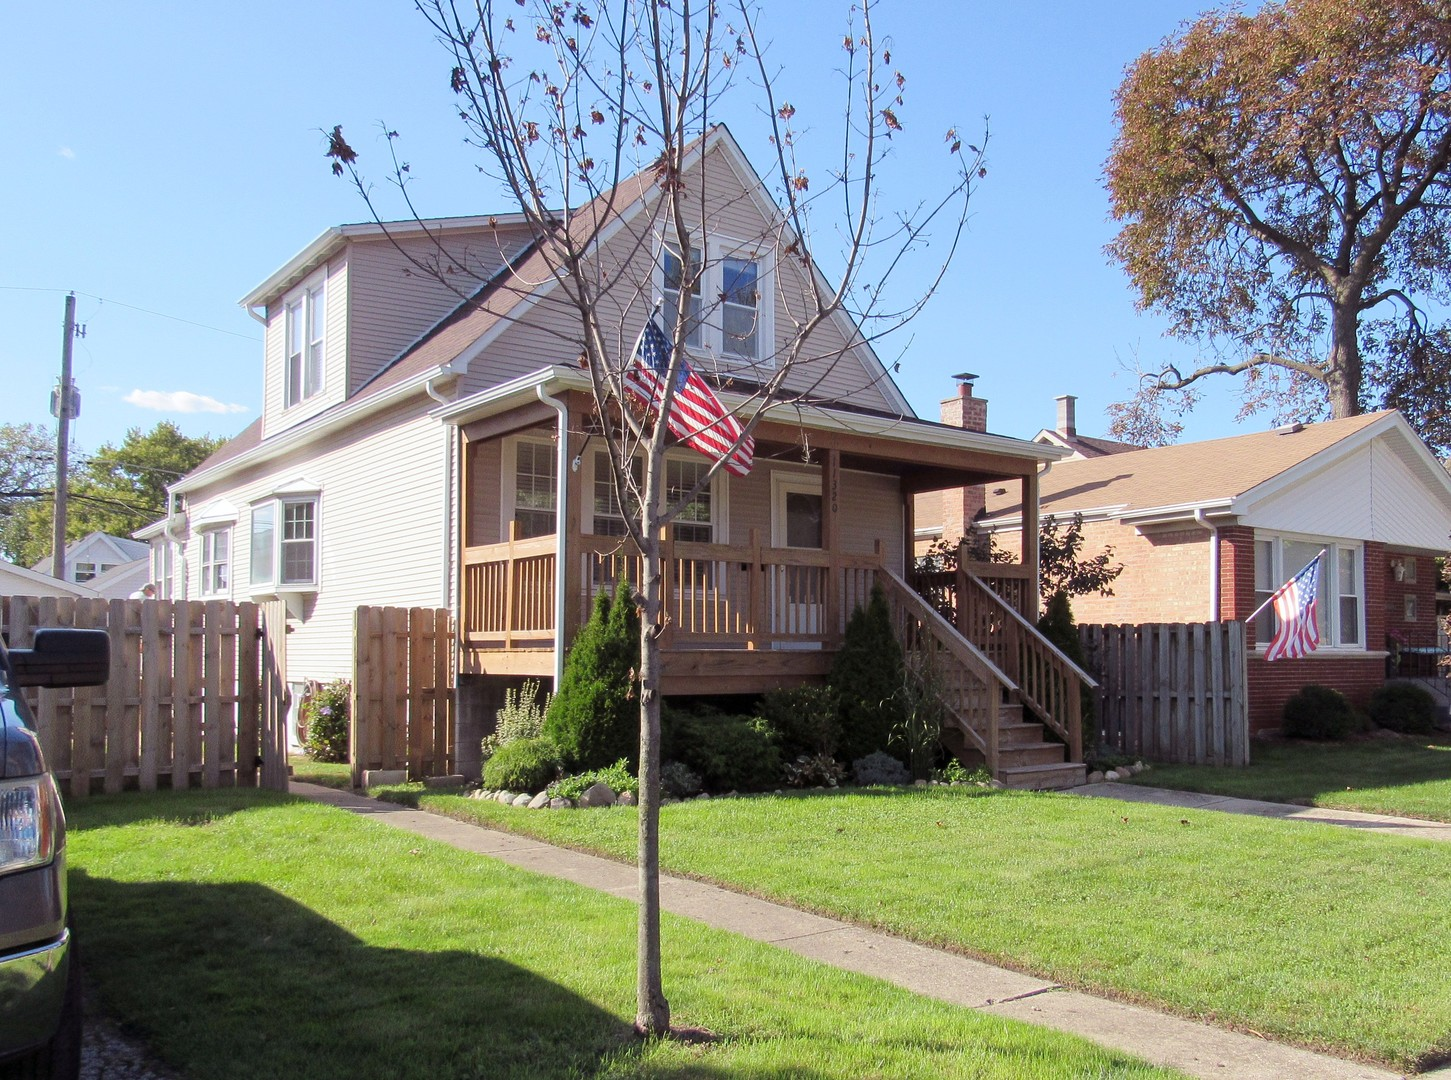 Photo of 11320 Kedzie Avenue Chicago IL 60655